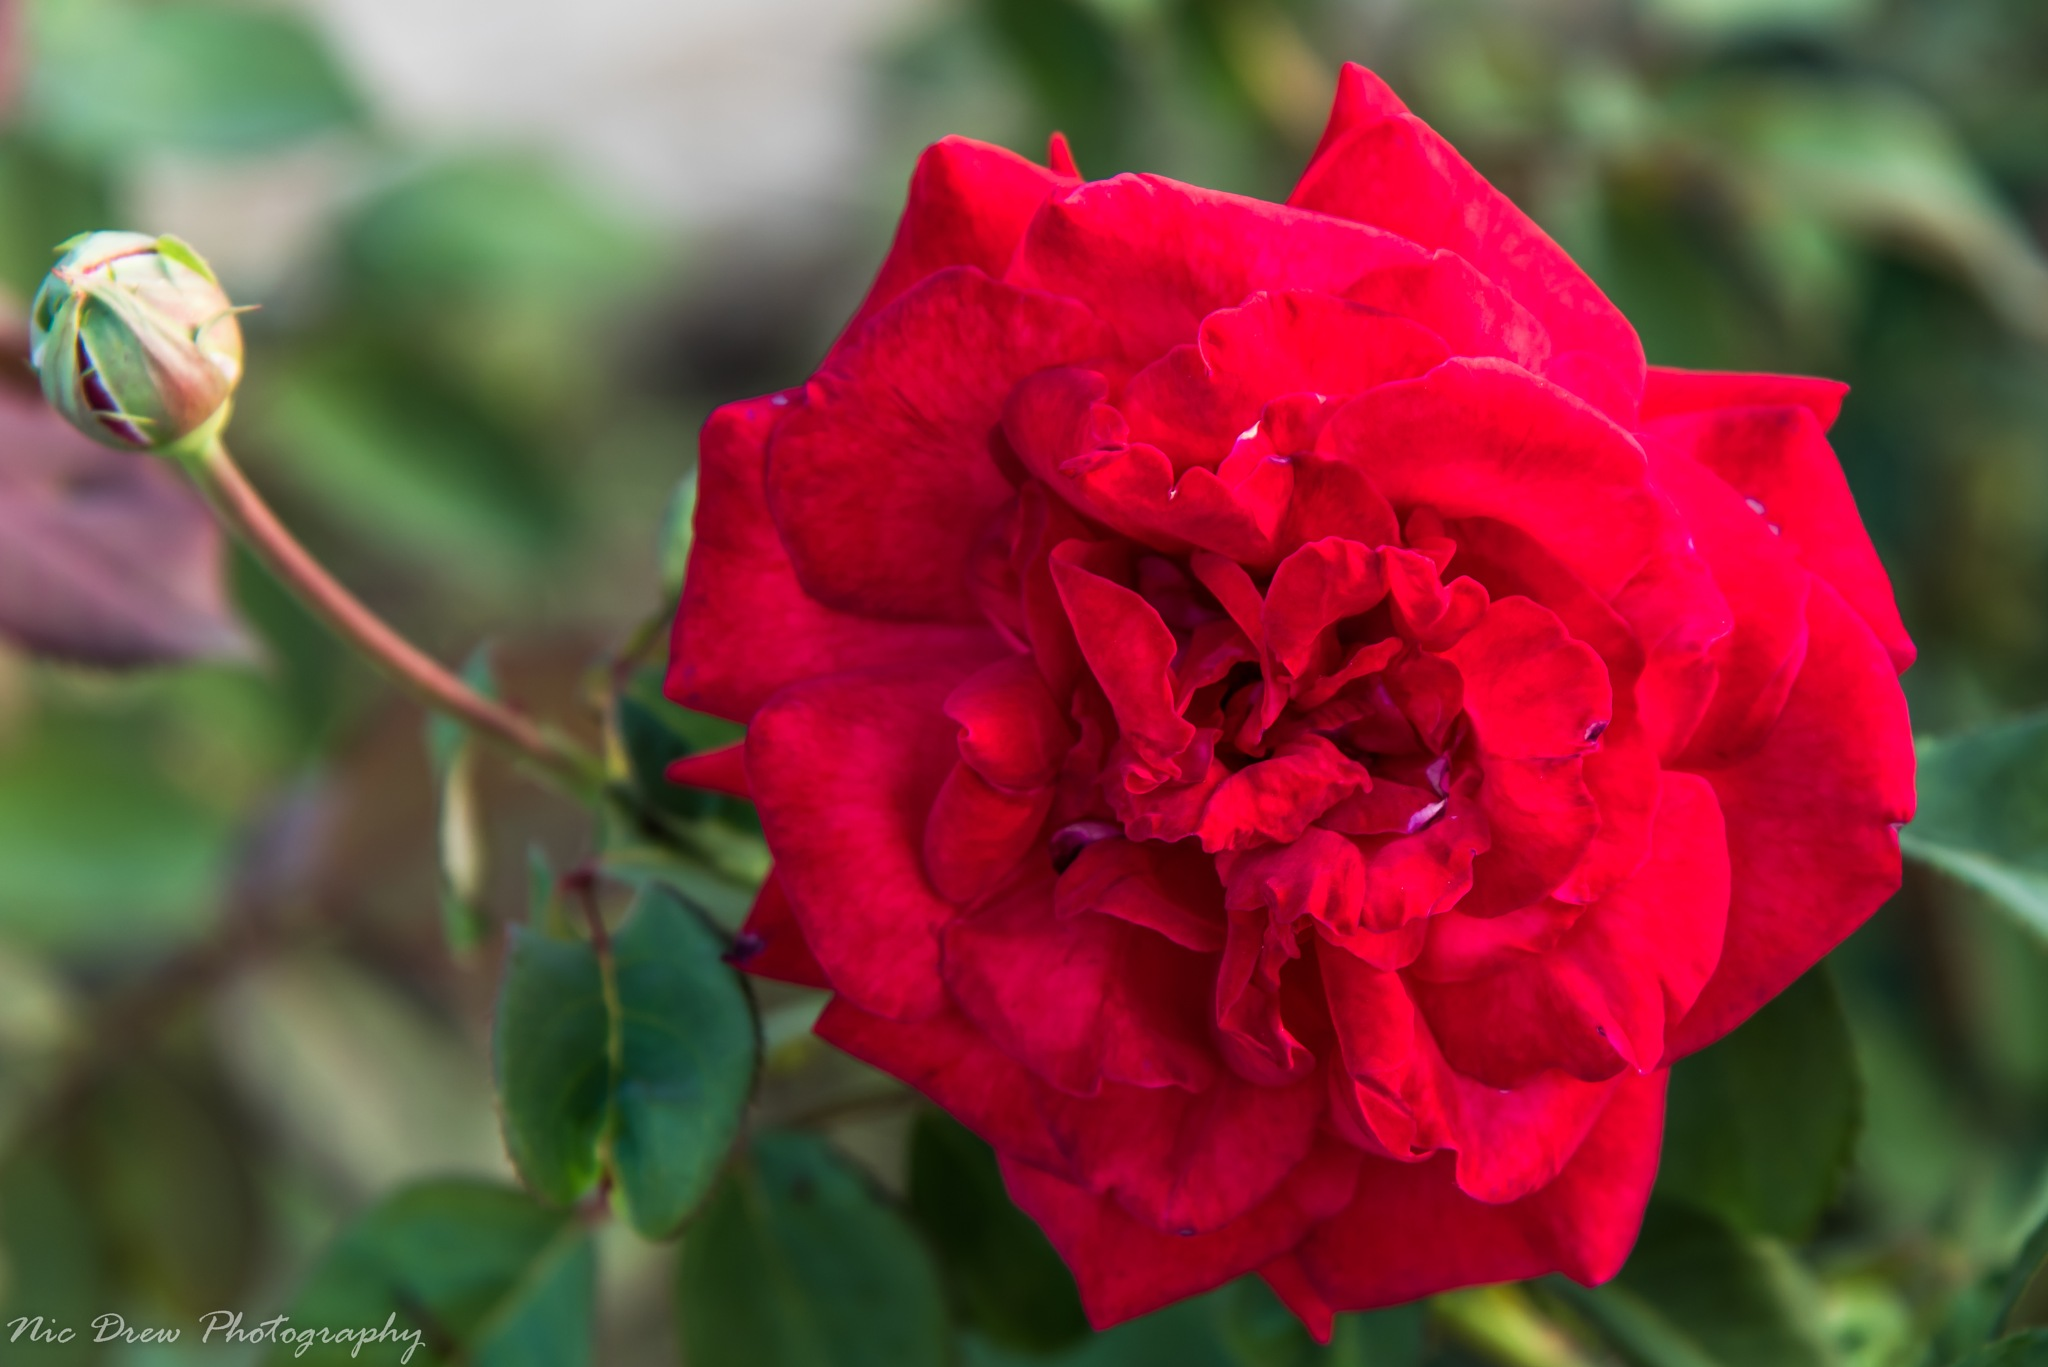 Flower 2 by Nic Drew